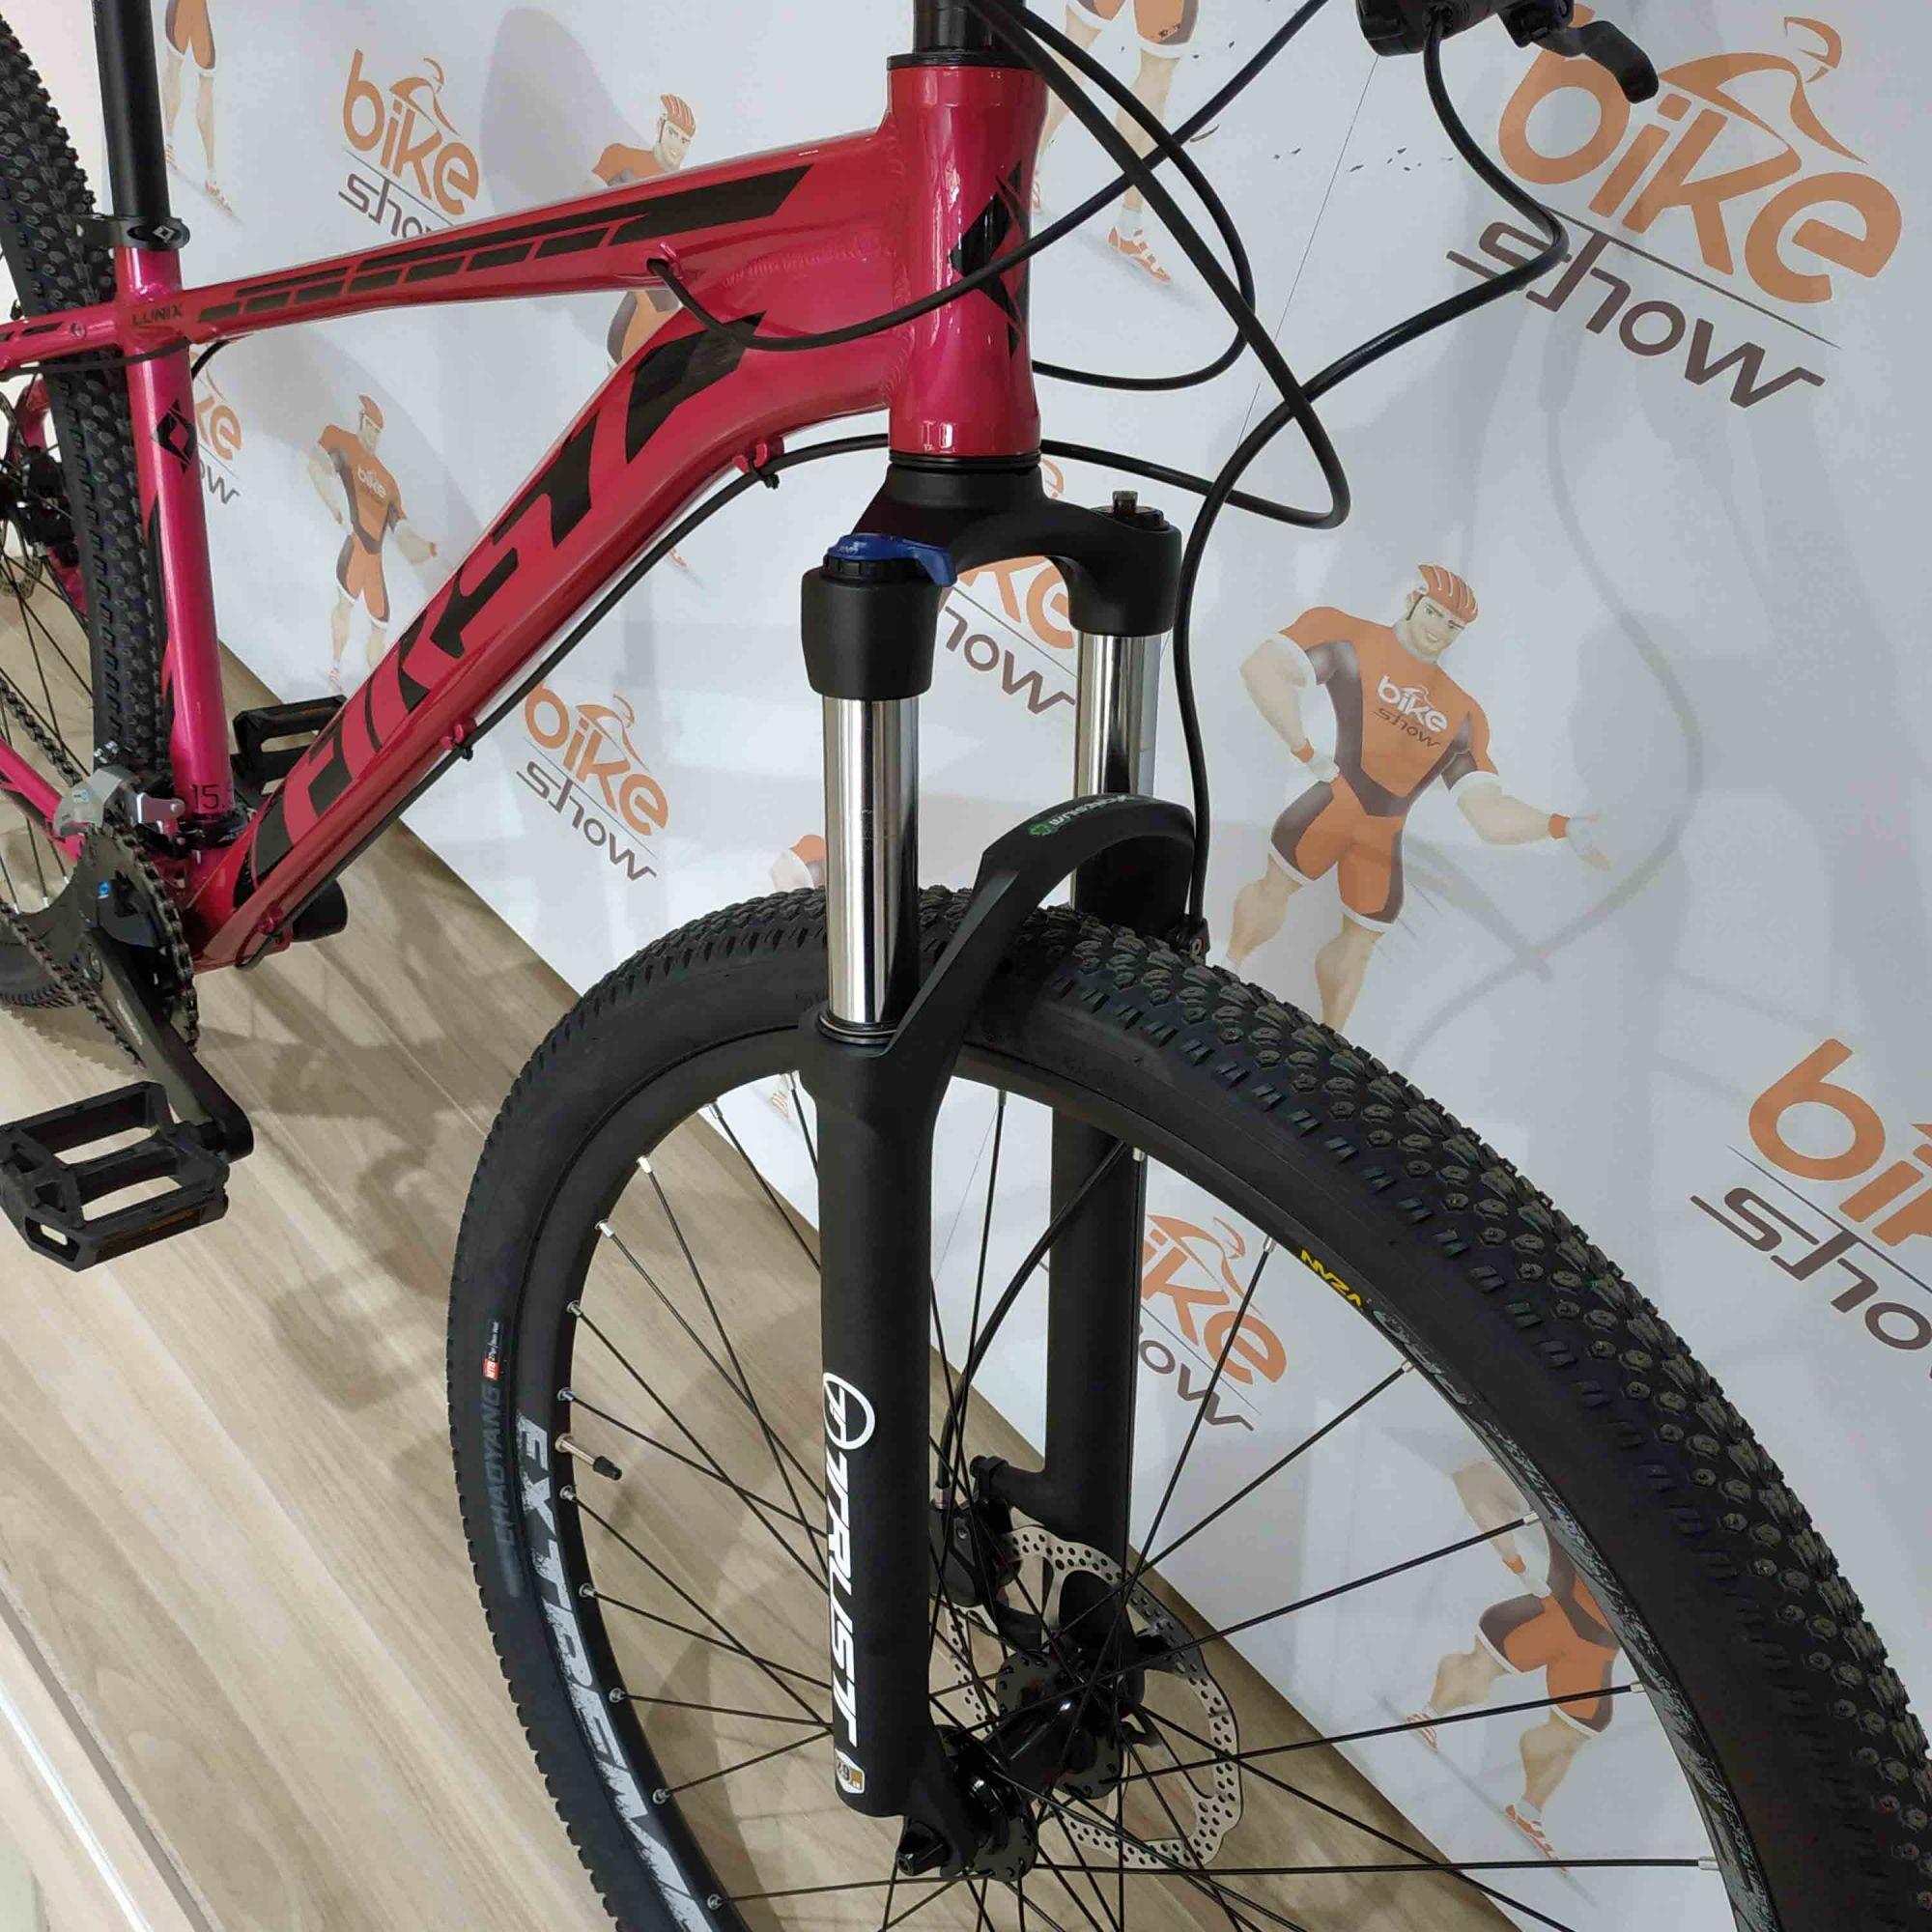 Bicicleta FIRST Lunix New 2020 aro 29 - 16v Shimano Altus - Freio Shimano Hidráulico - K7 Sunrace 11/40 dentes